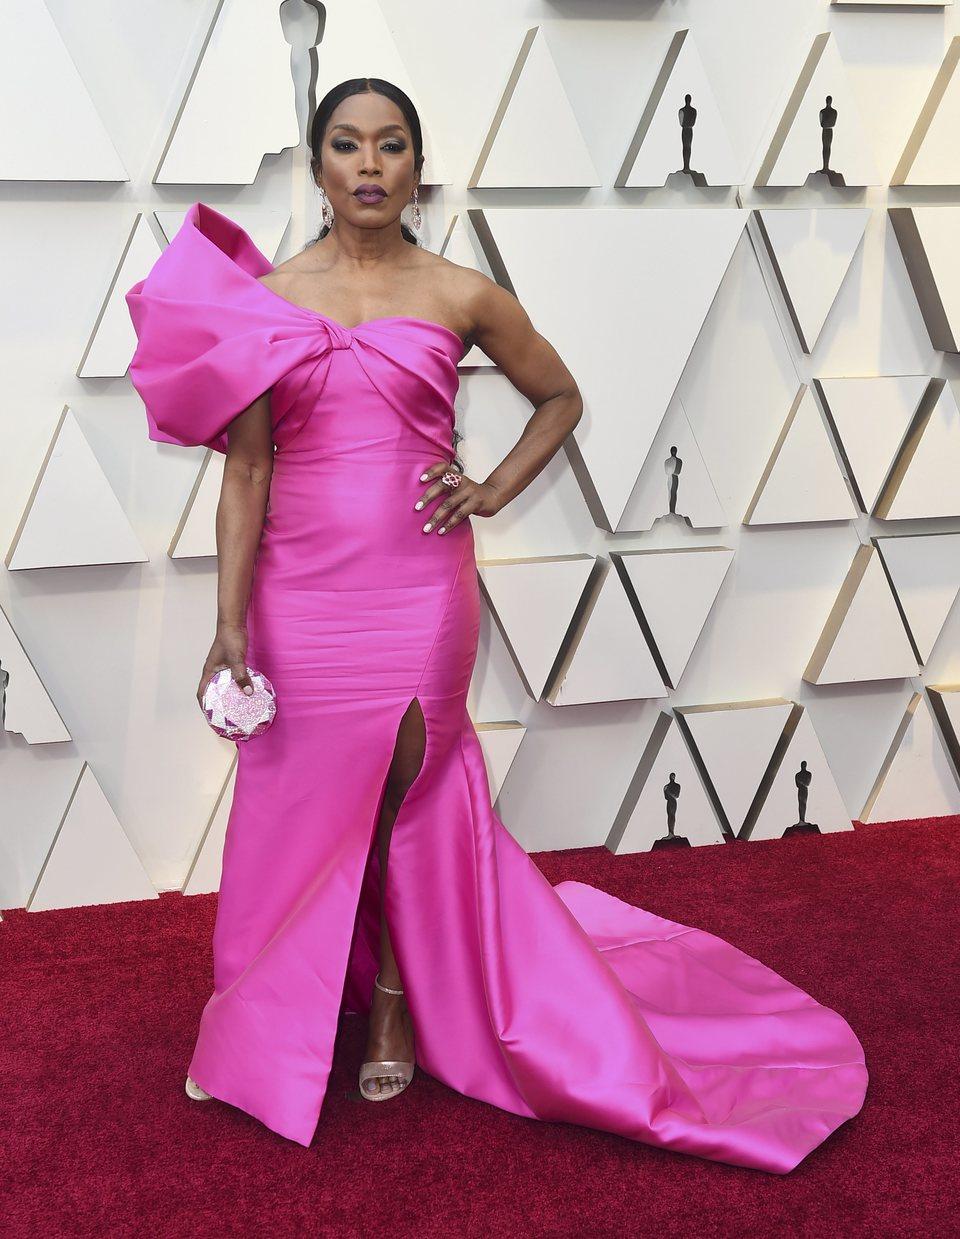 Angela Bassett en la alfombra roja de los Oscar 2019